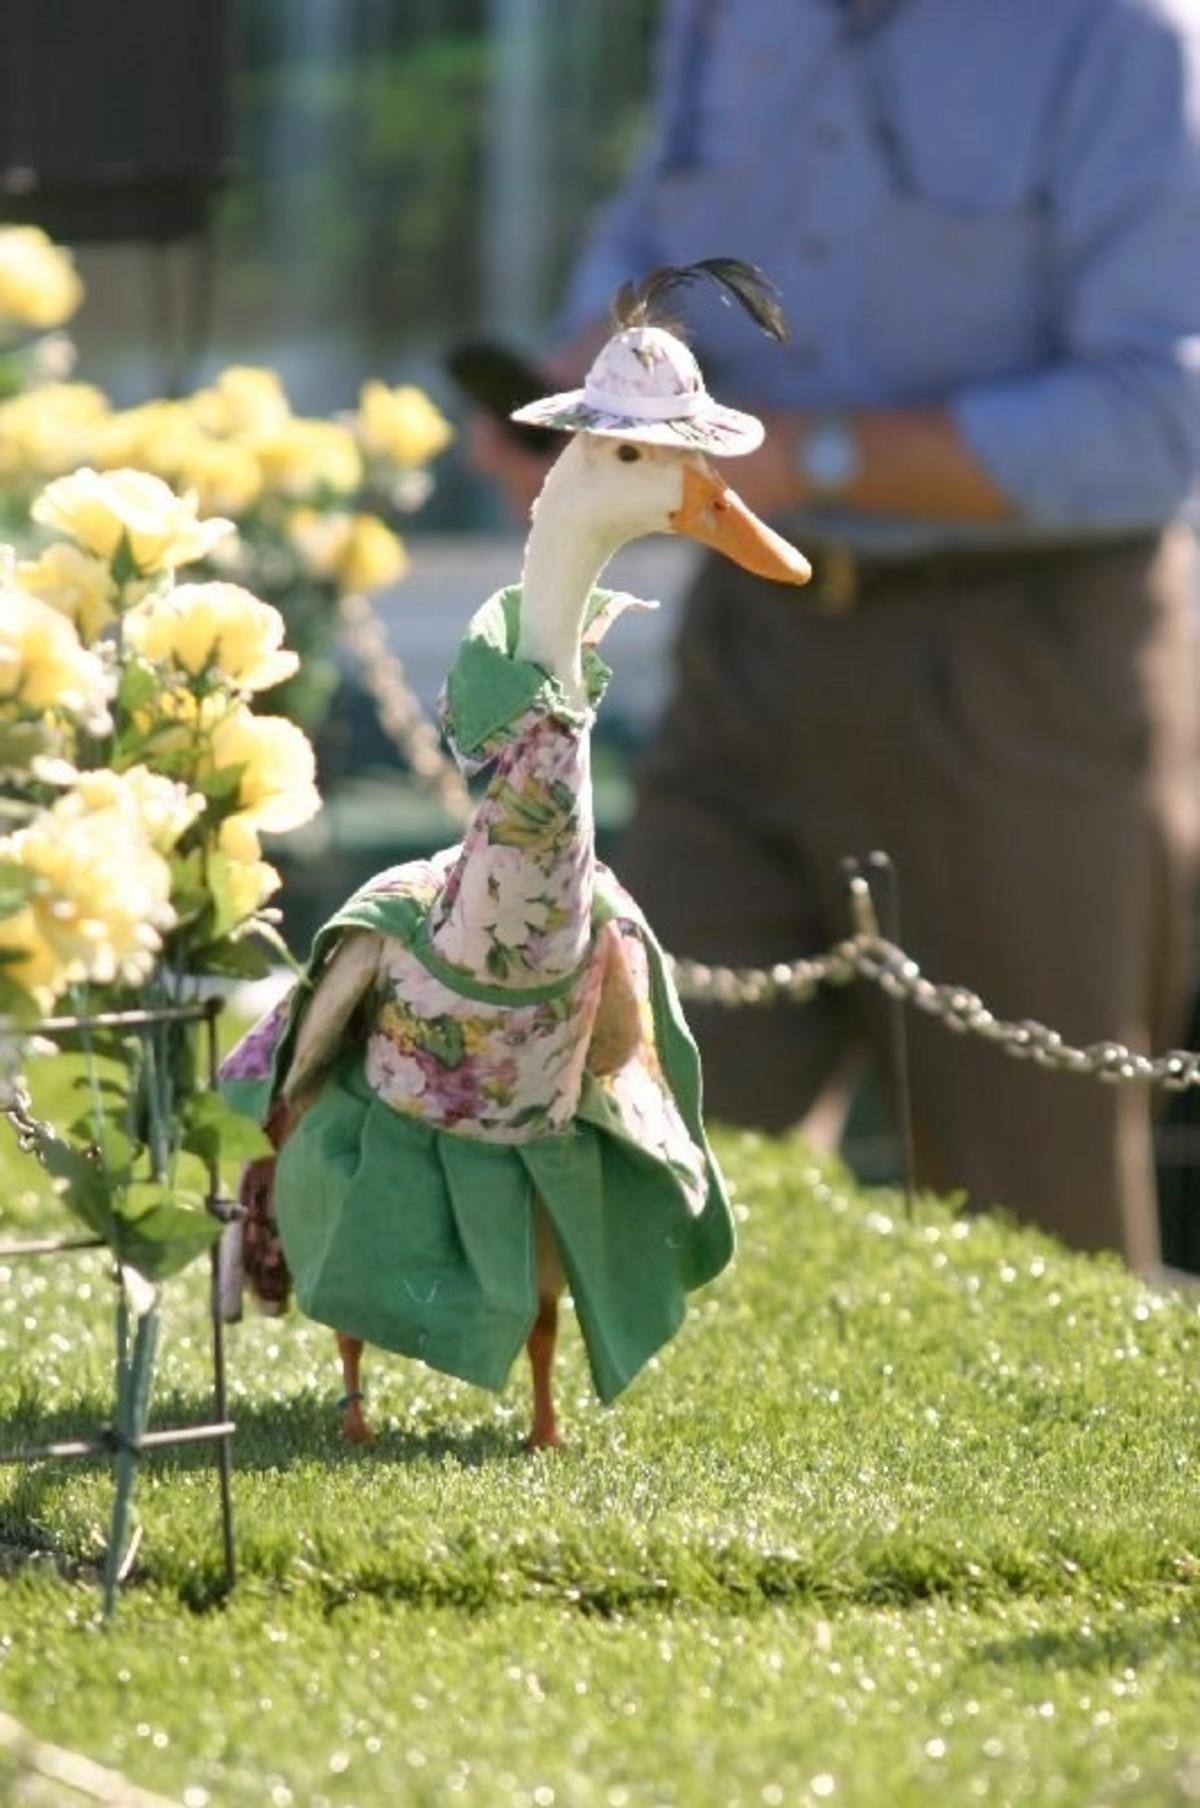 Ducks. .. How do you keep them still long enough to dress them? Ducks How do you keep them still long enough to dress them?